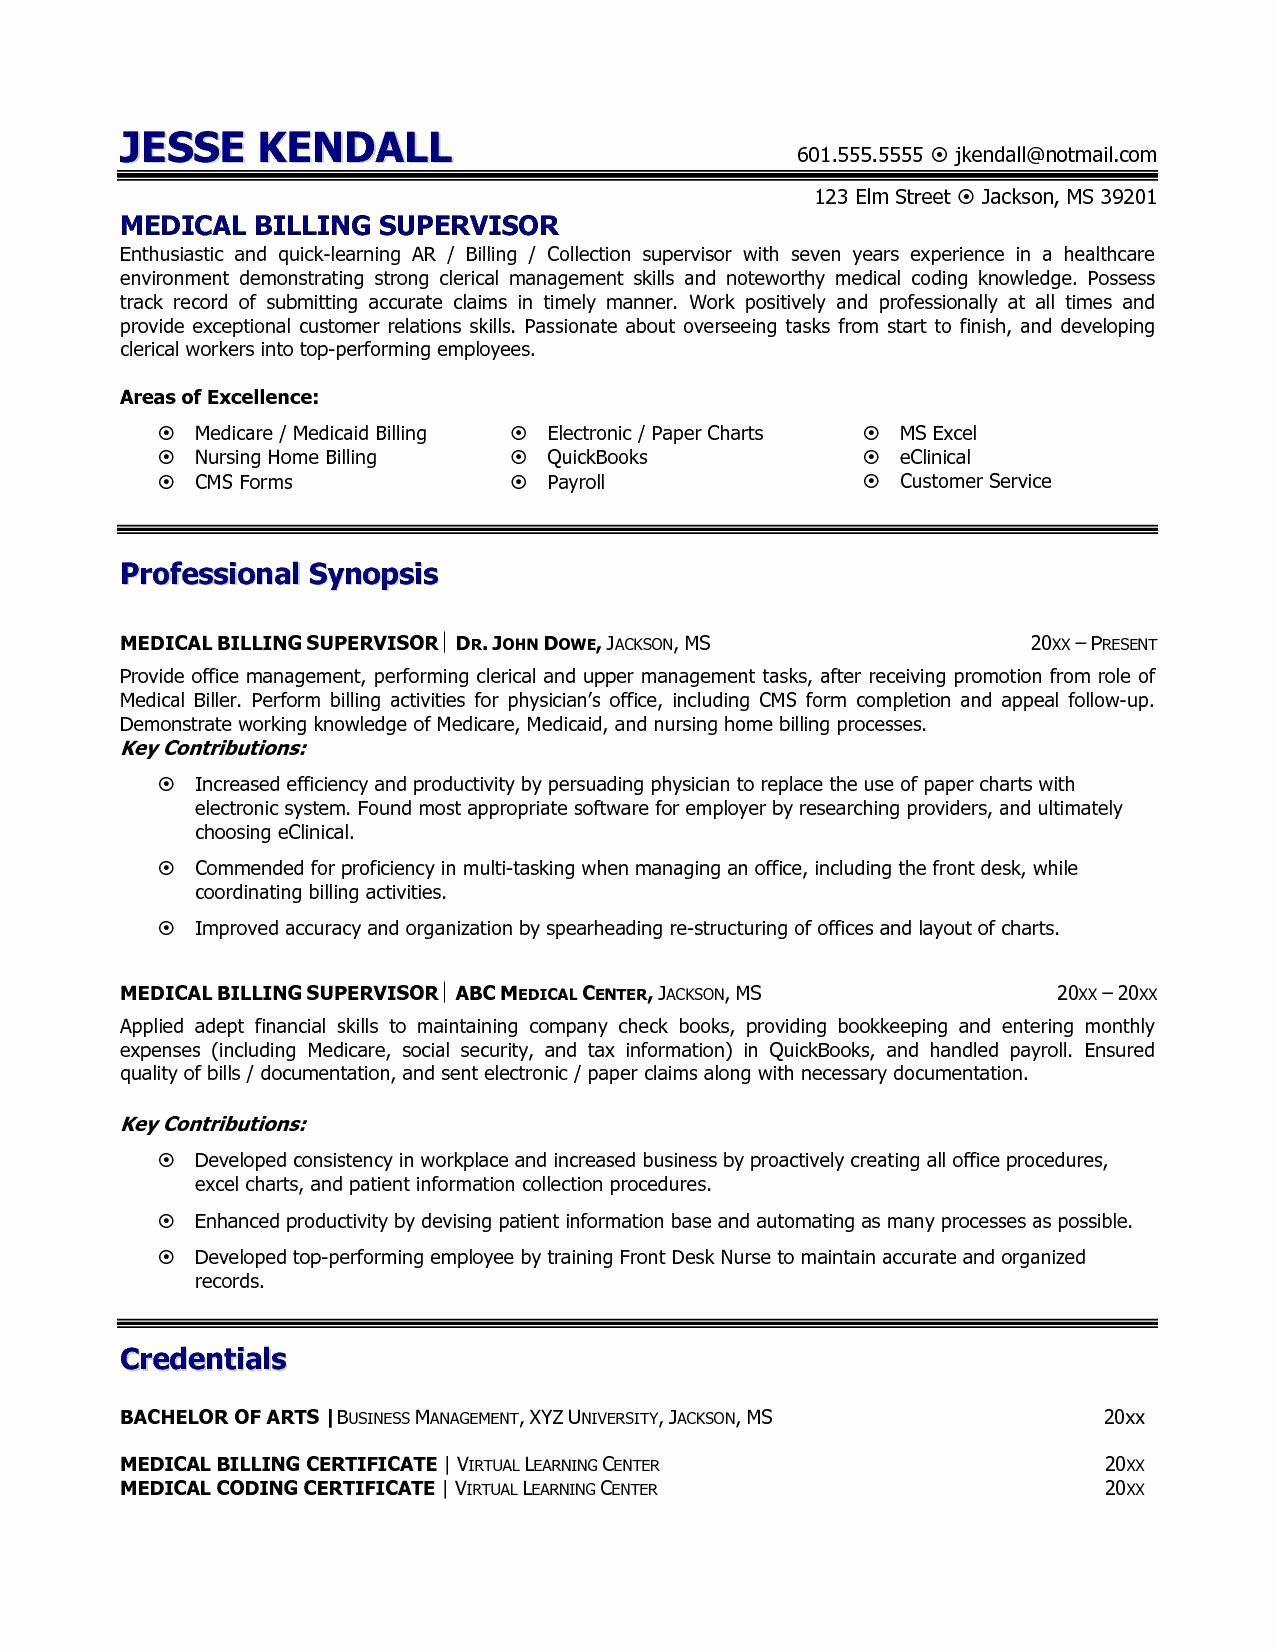 b530b36ea33cf2561efdd0aee3dbf029 - Medicaid Non Billing Provider Application